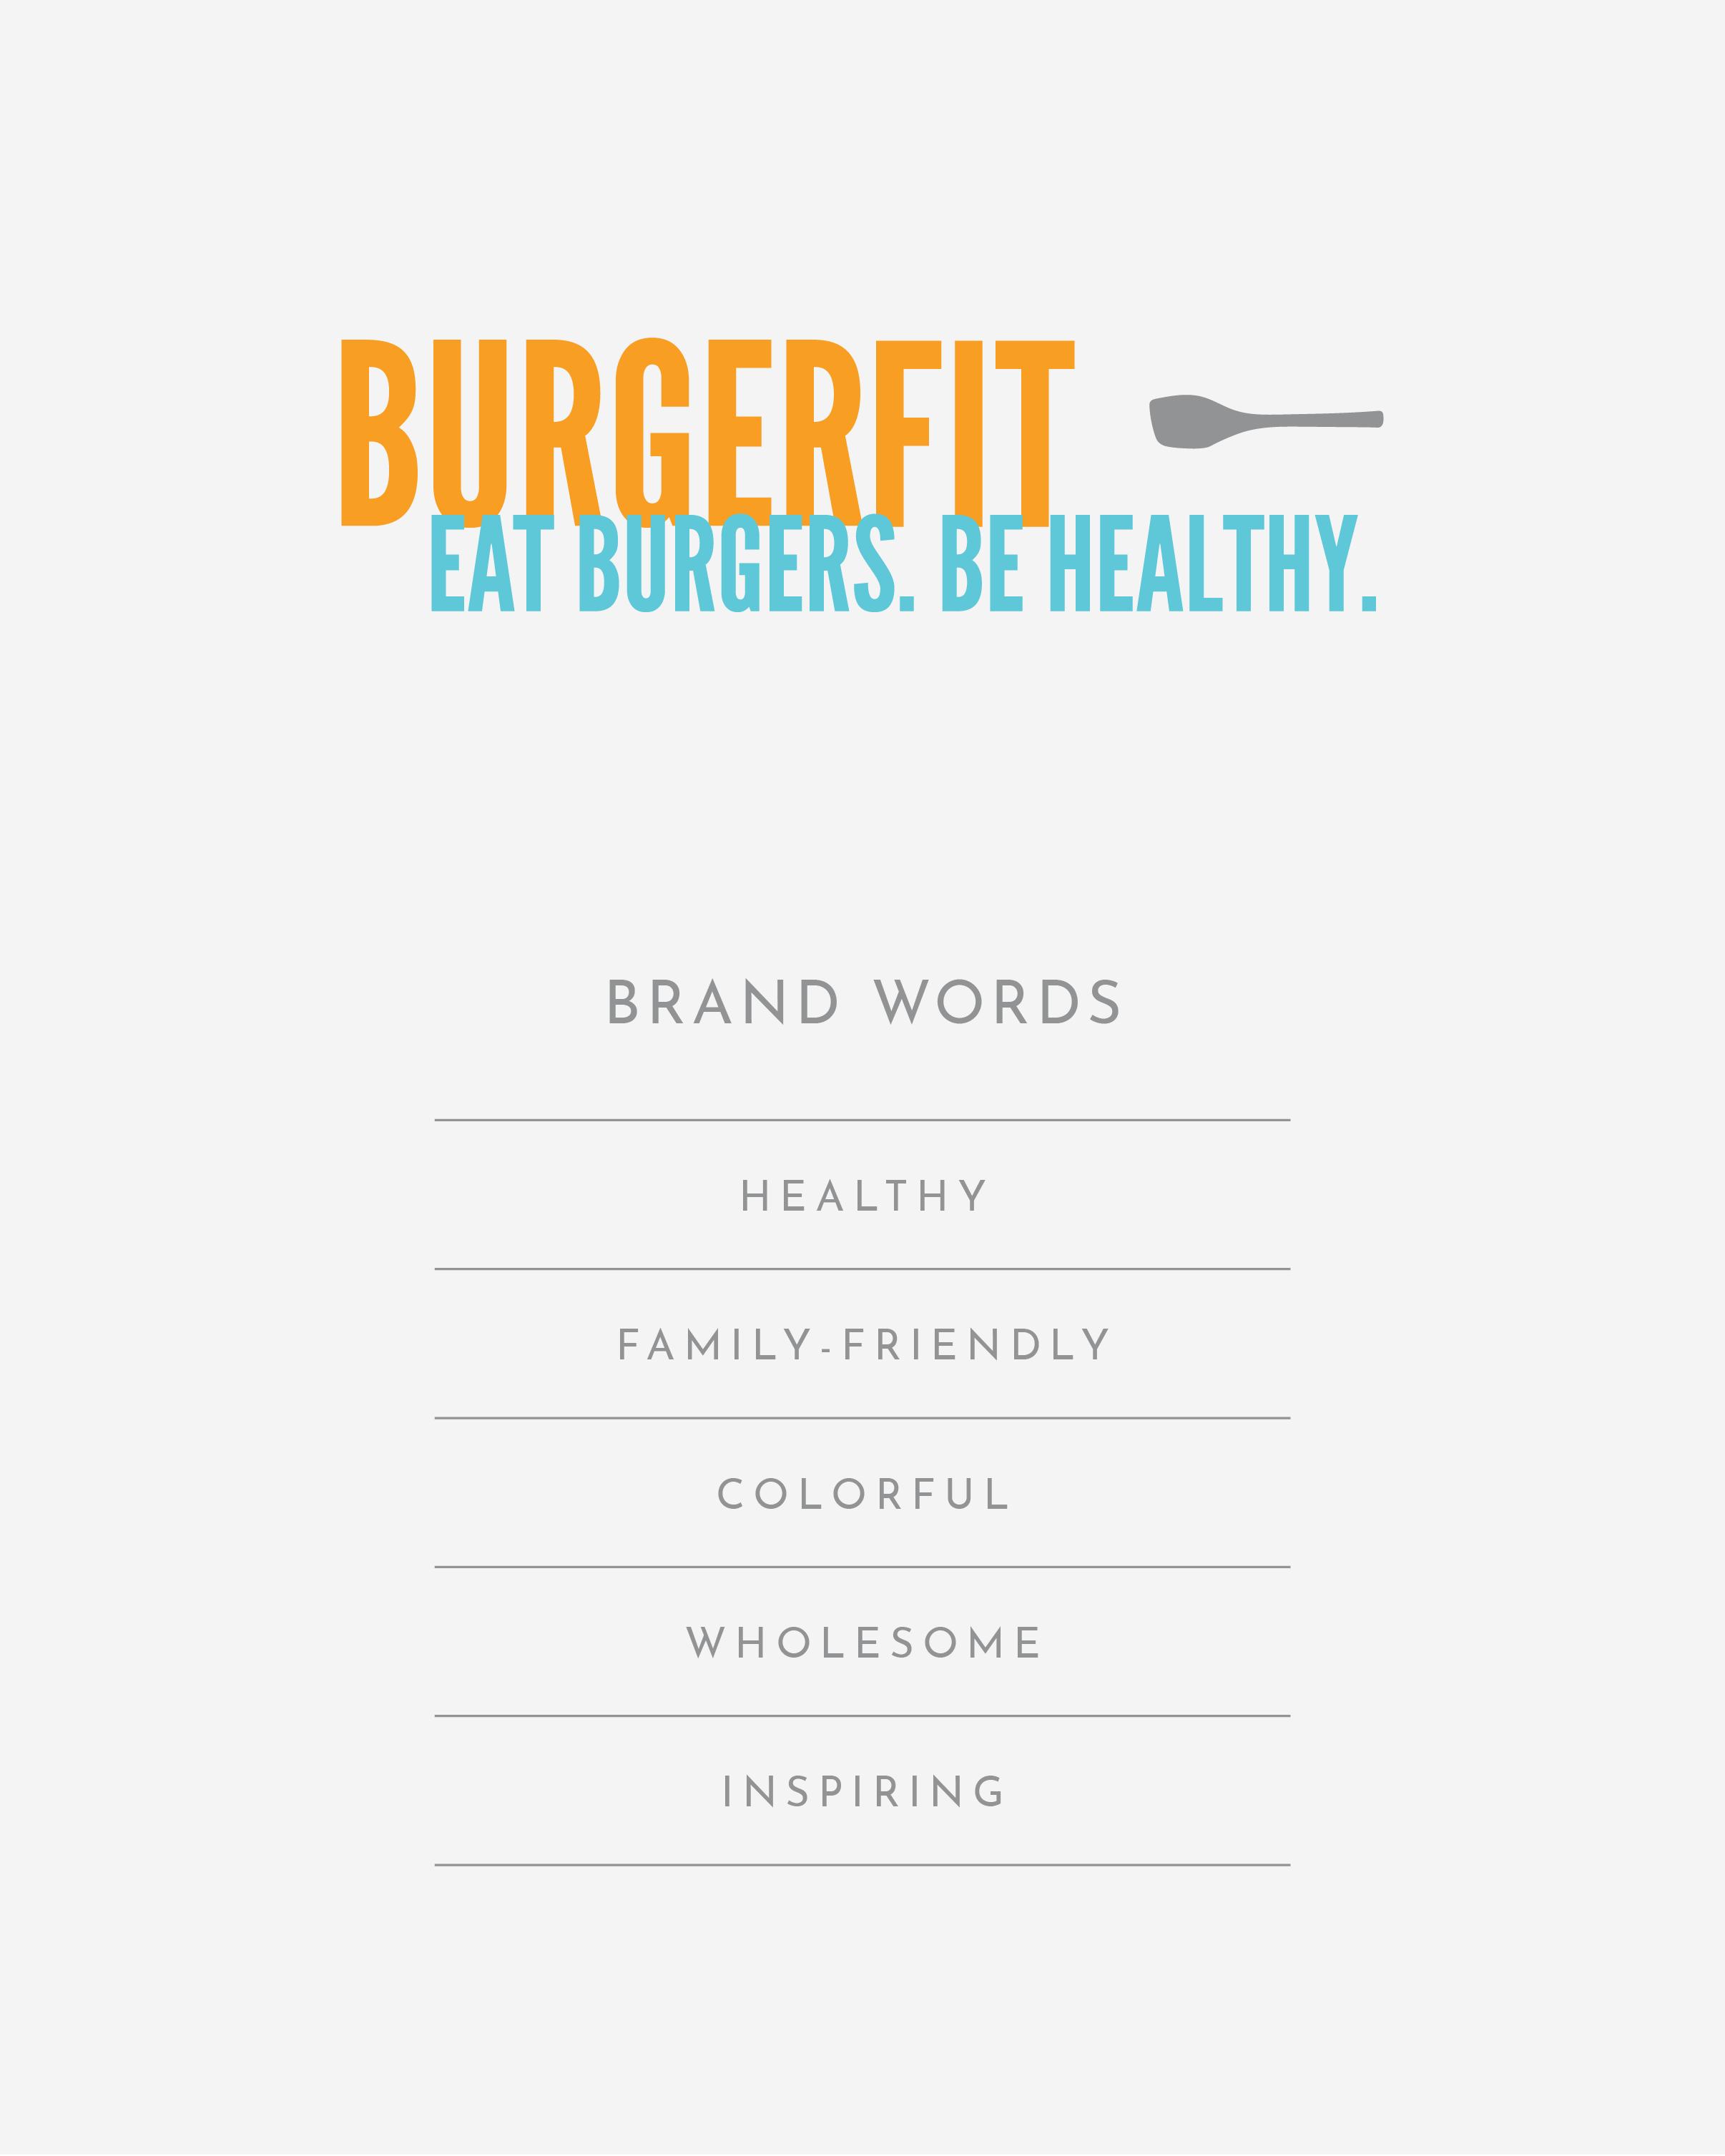 BURGERFIT_portfolio_BrandWords.png